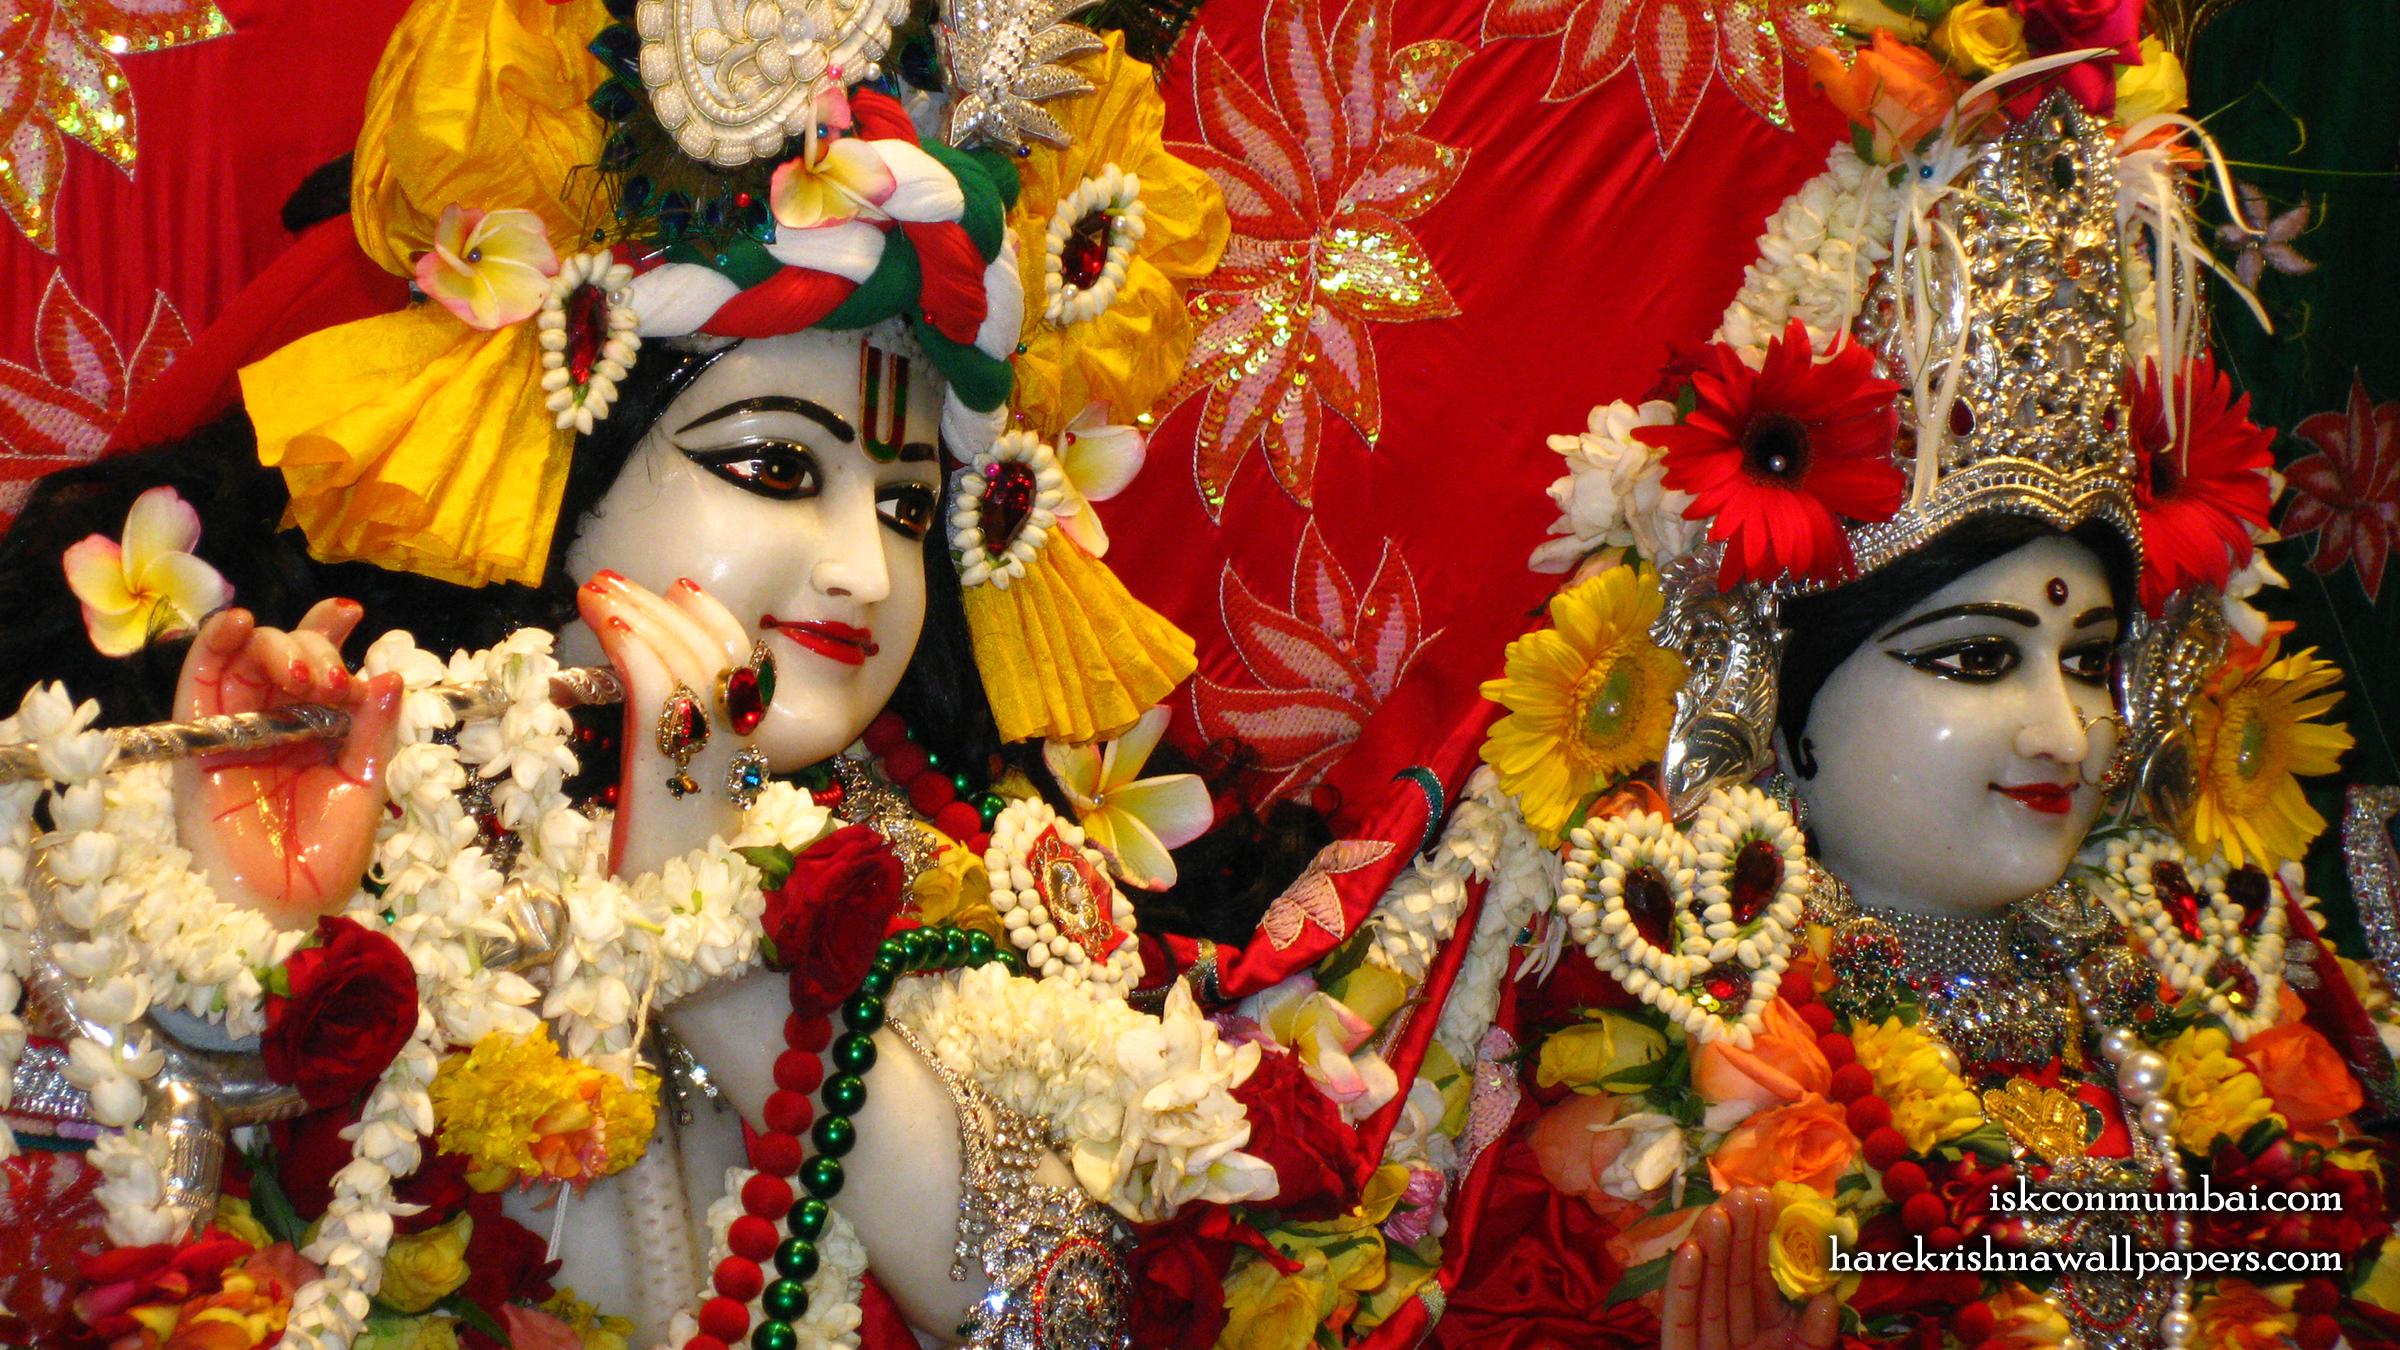 Sri Sri Radha Rasabihari Close up Wallpaper (026) Size 2400x1350 Download